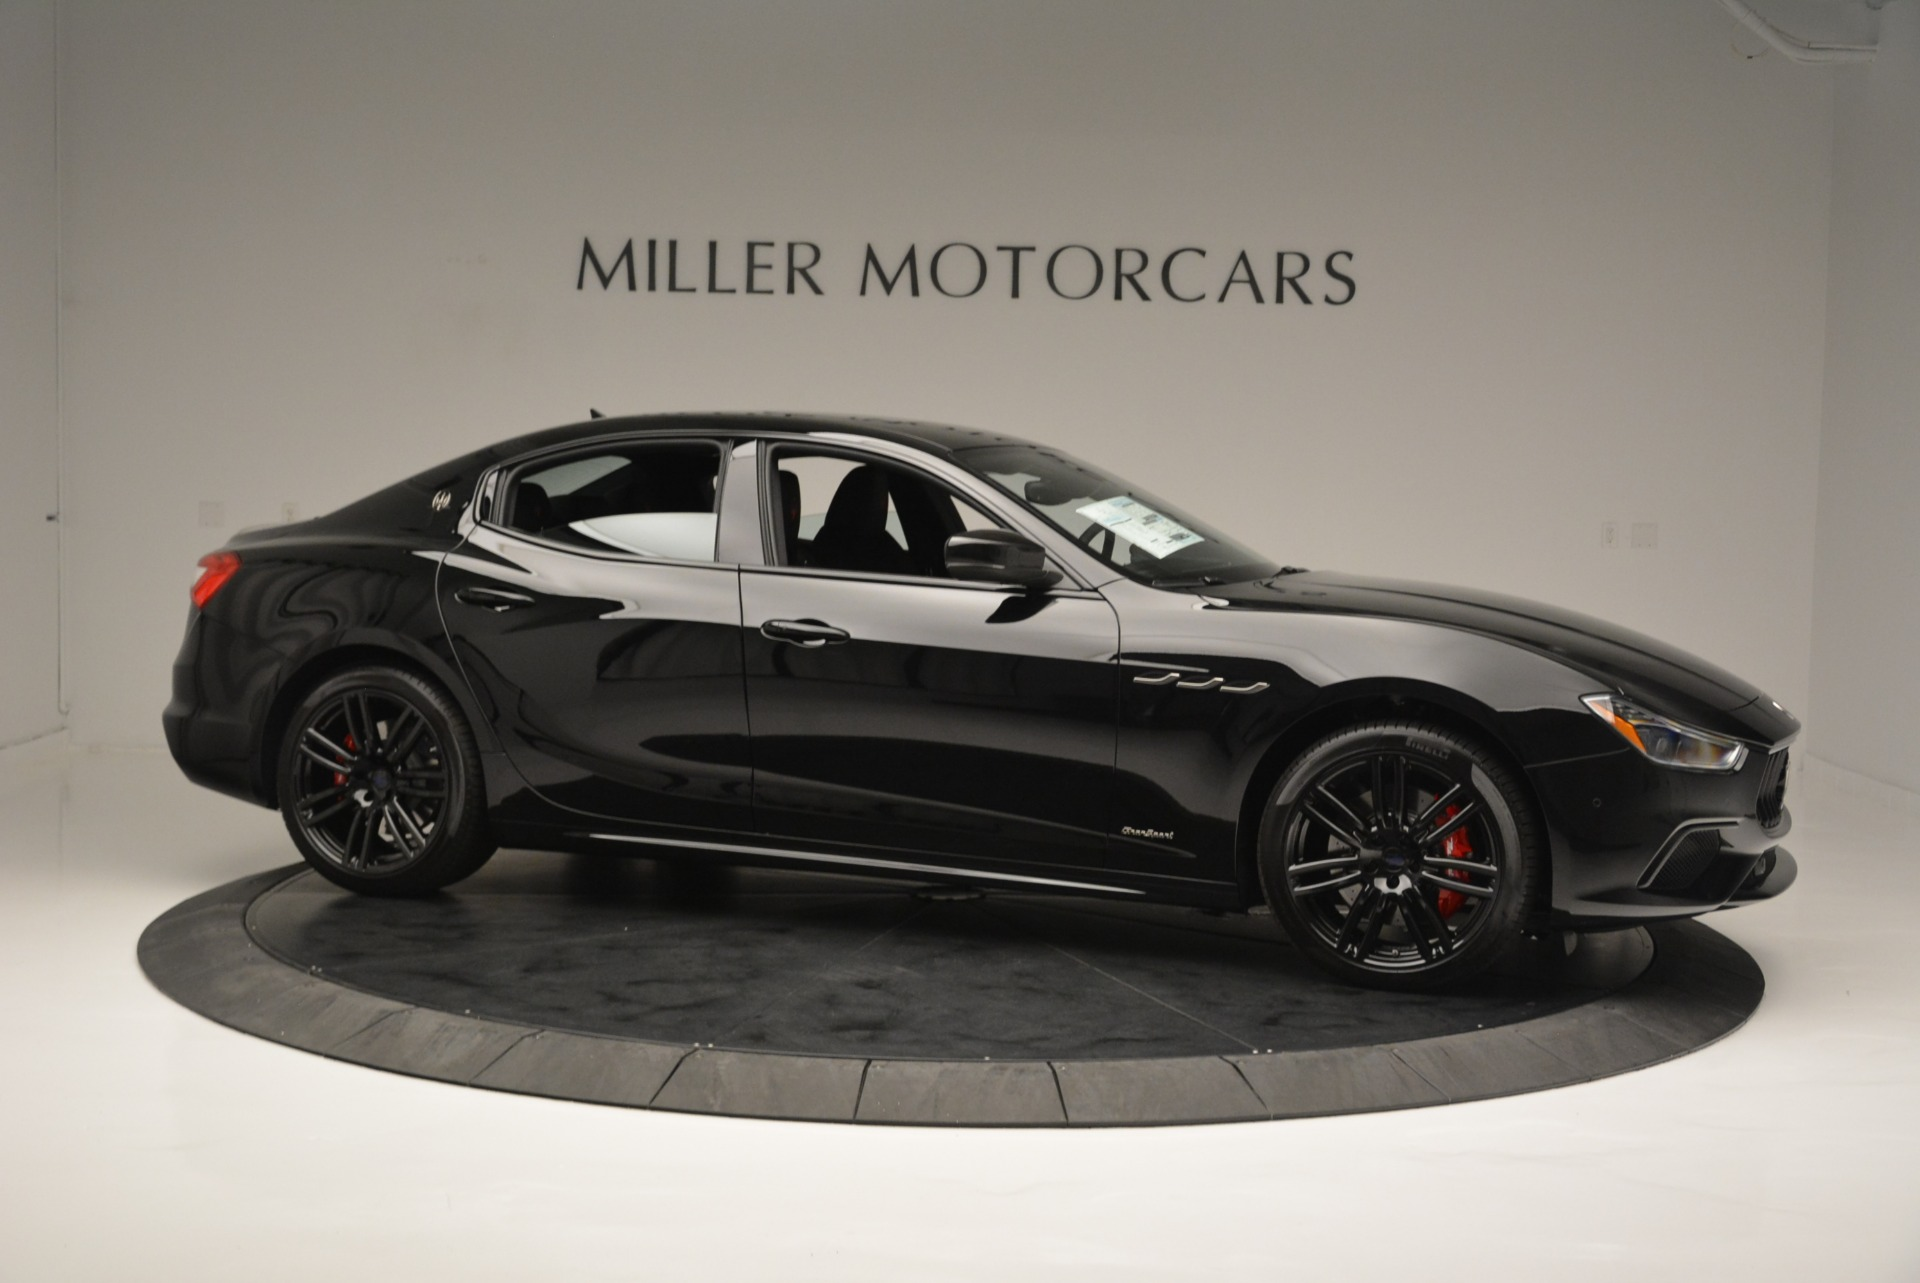 New 2018 Maserati Ghibli SQ4 GranSport Nerissimo For Sale In Westport, CT 2368_p10